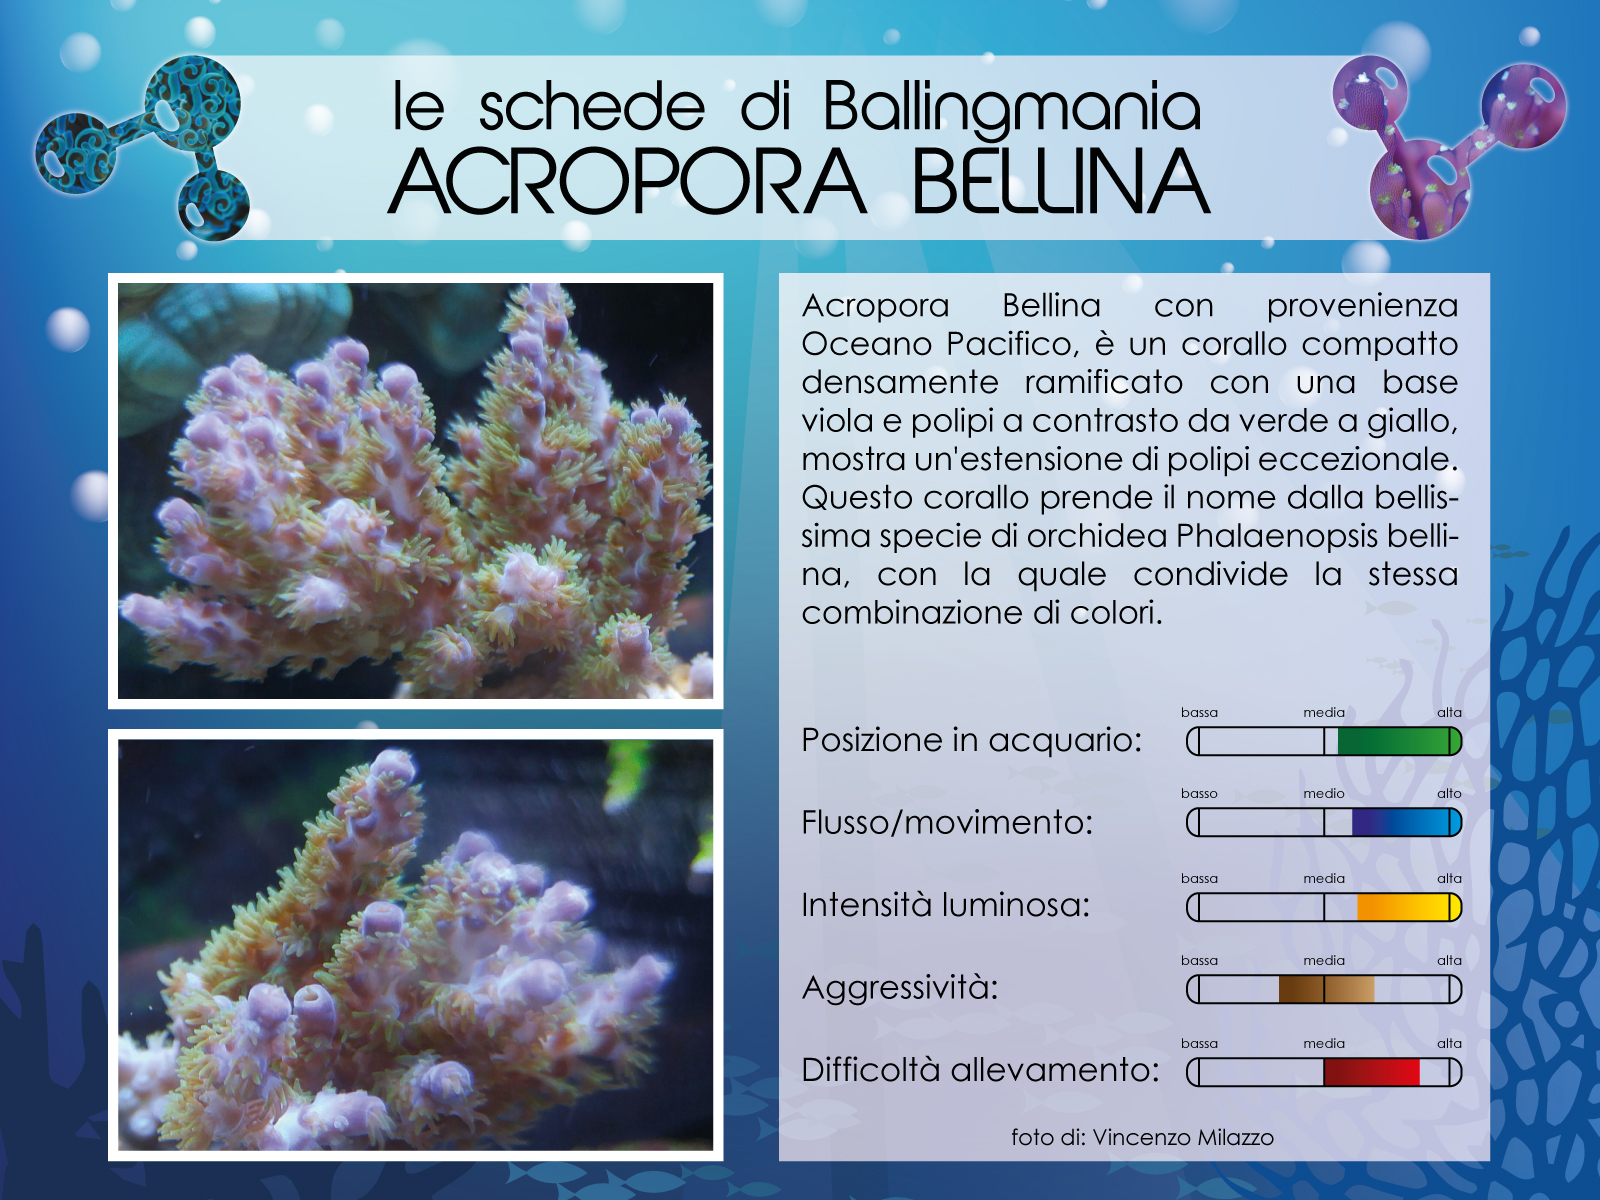 Acropora Bellina